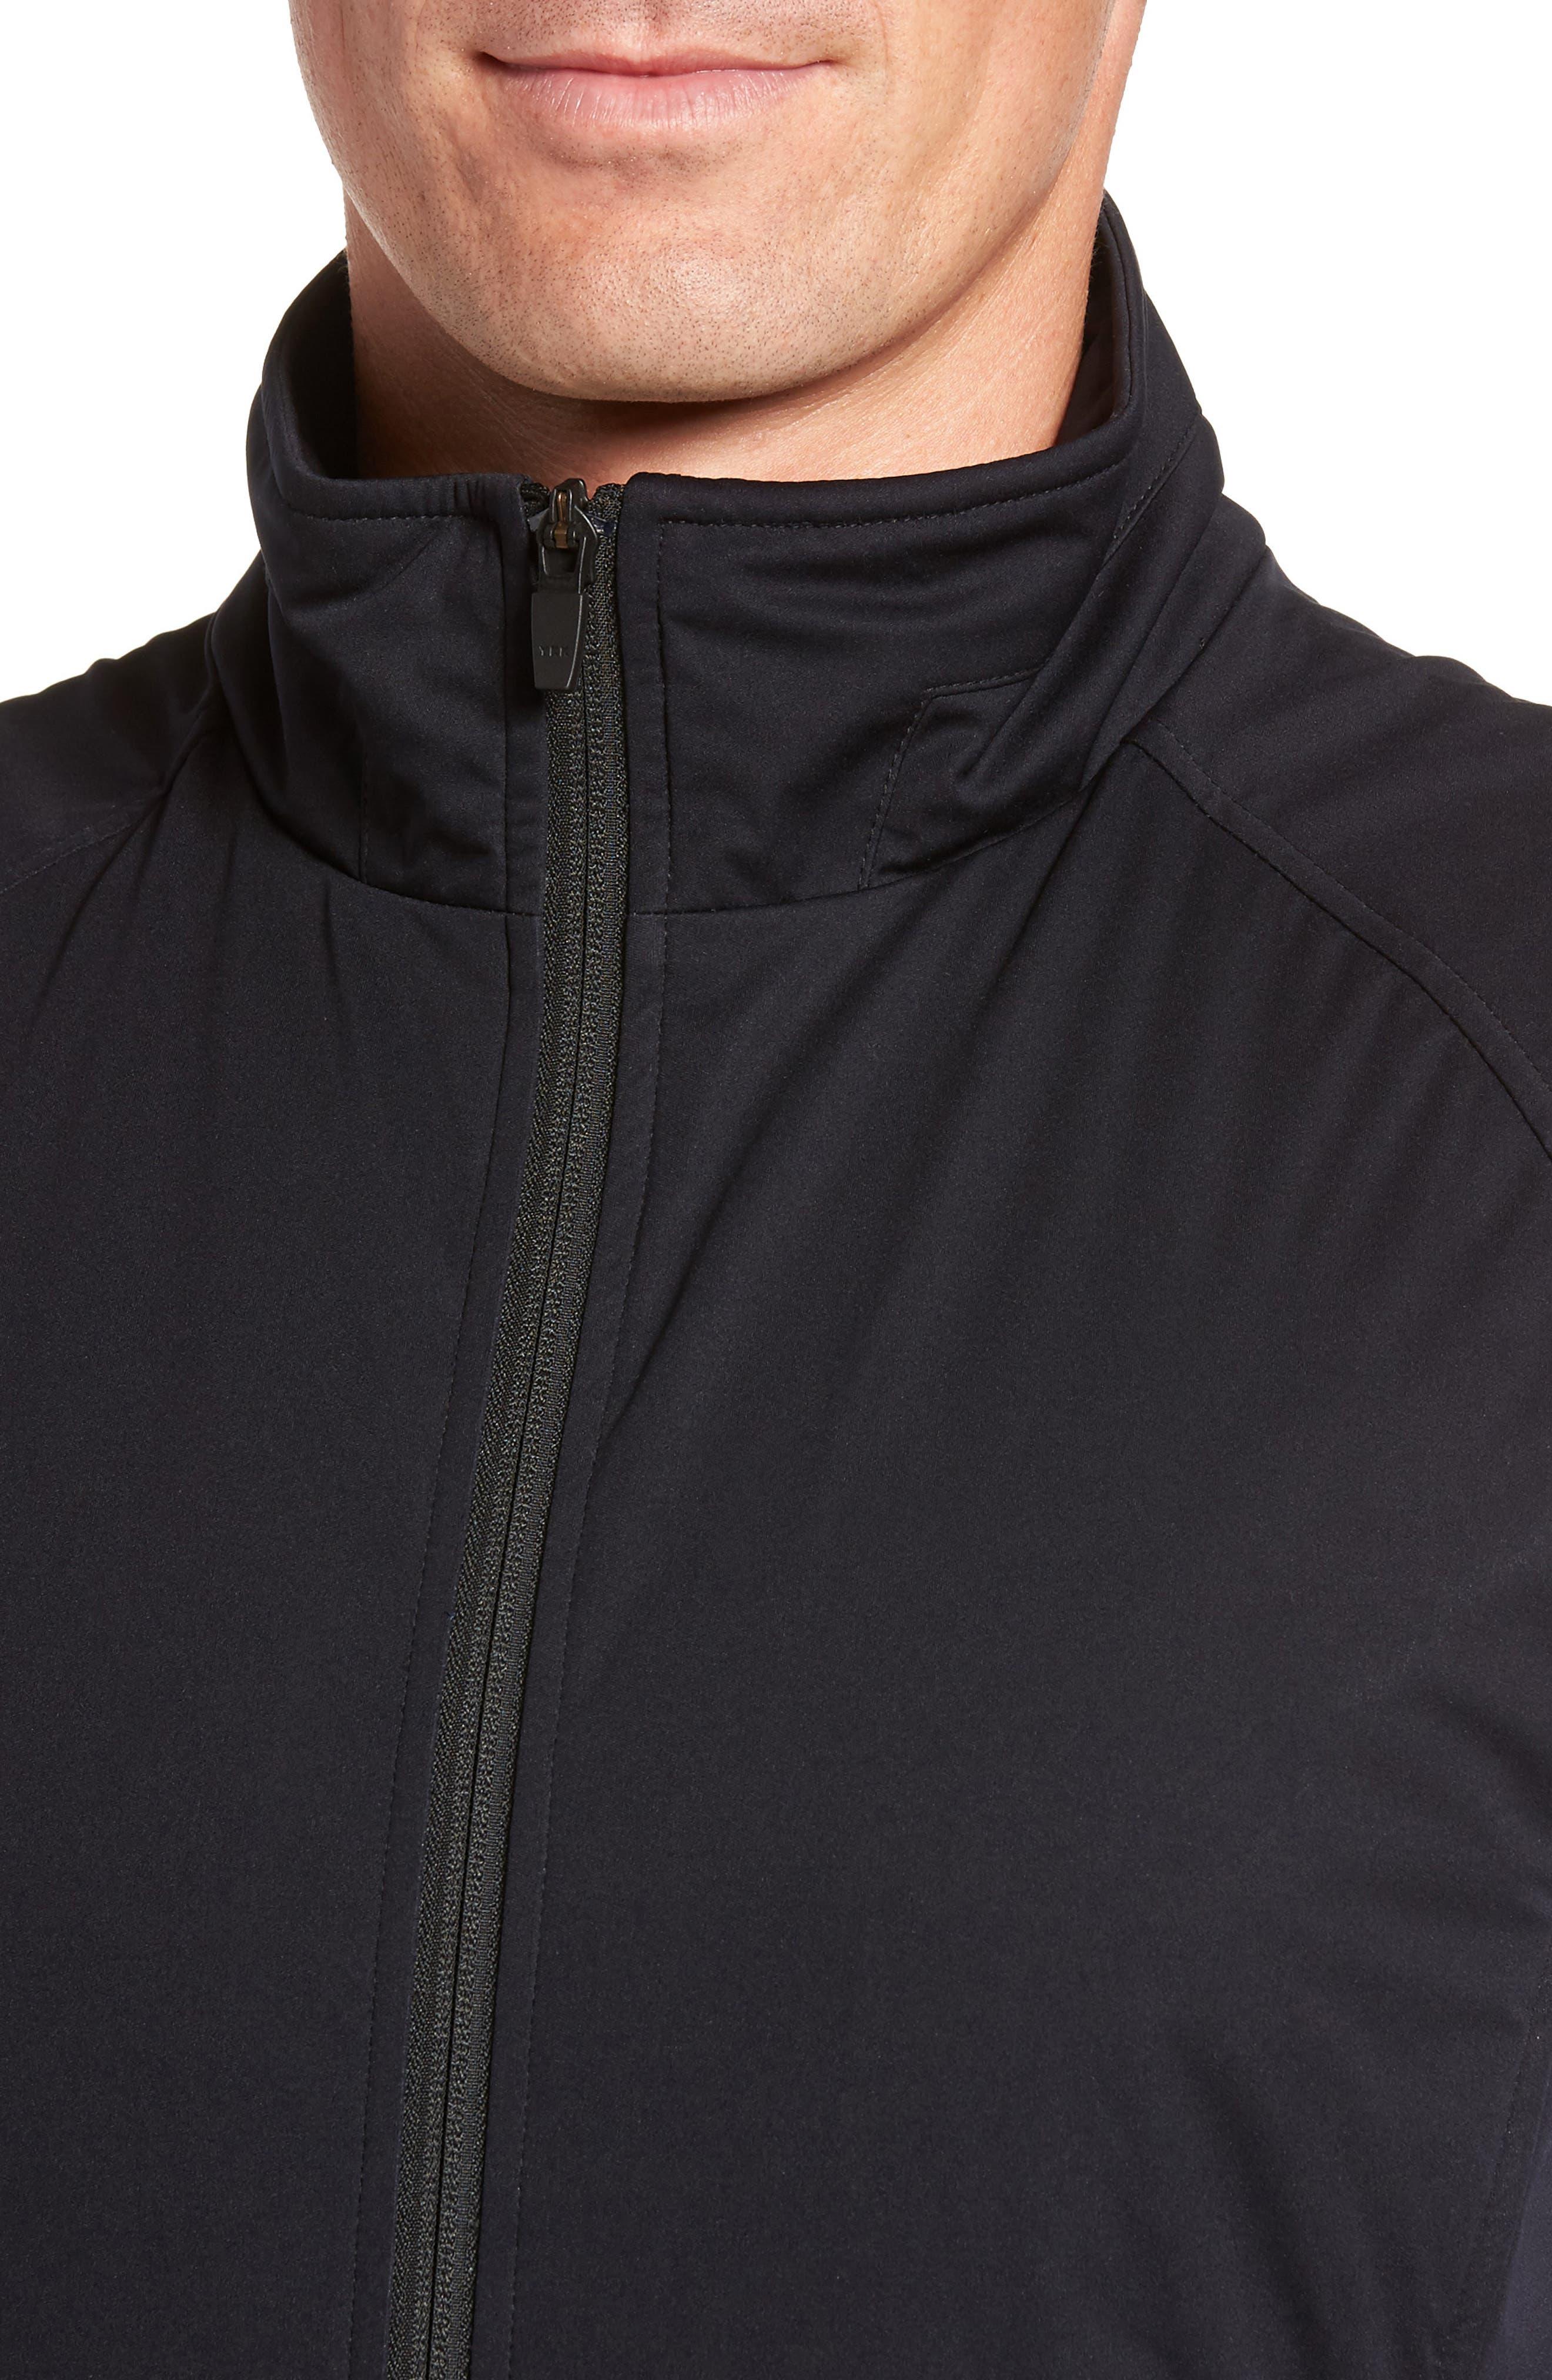 Soft Shell Zip Vest,                             Alternate thumbnail 4, color,                             Black